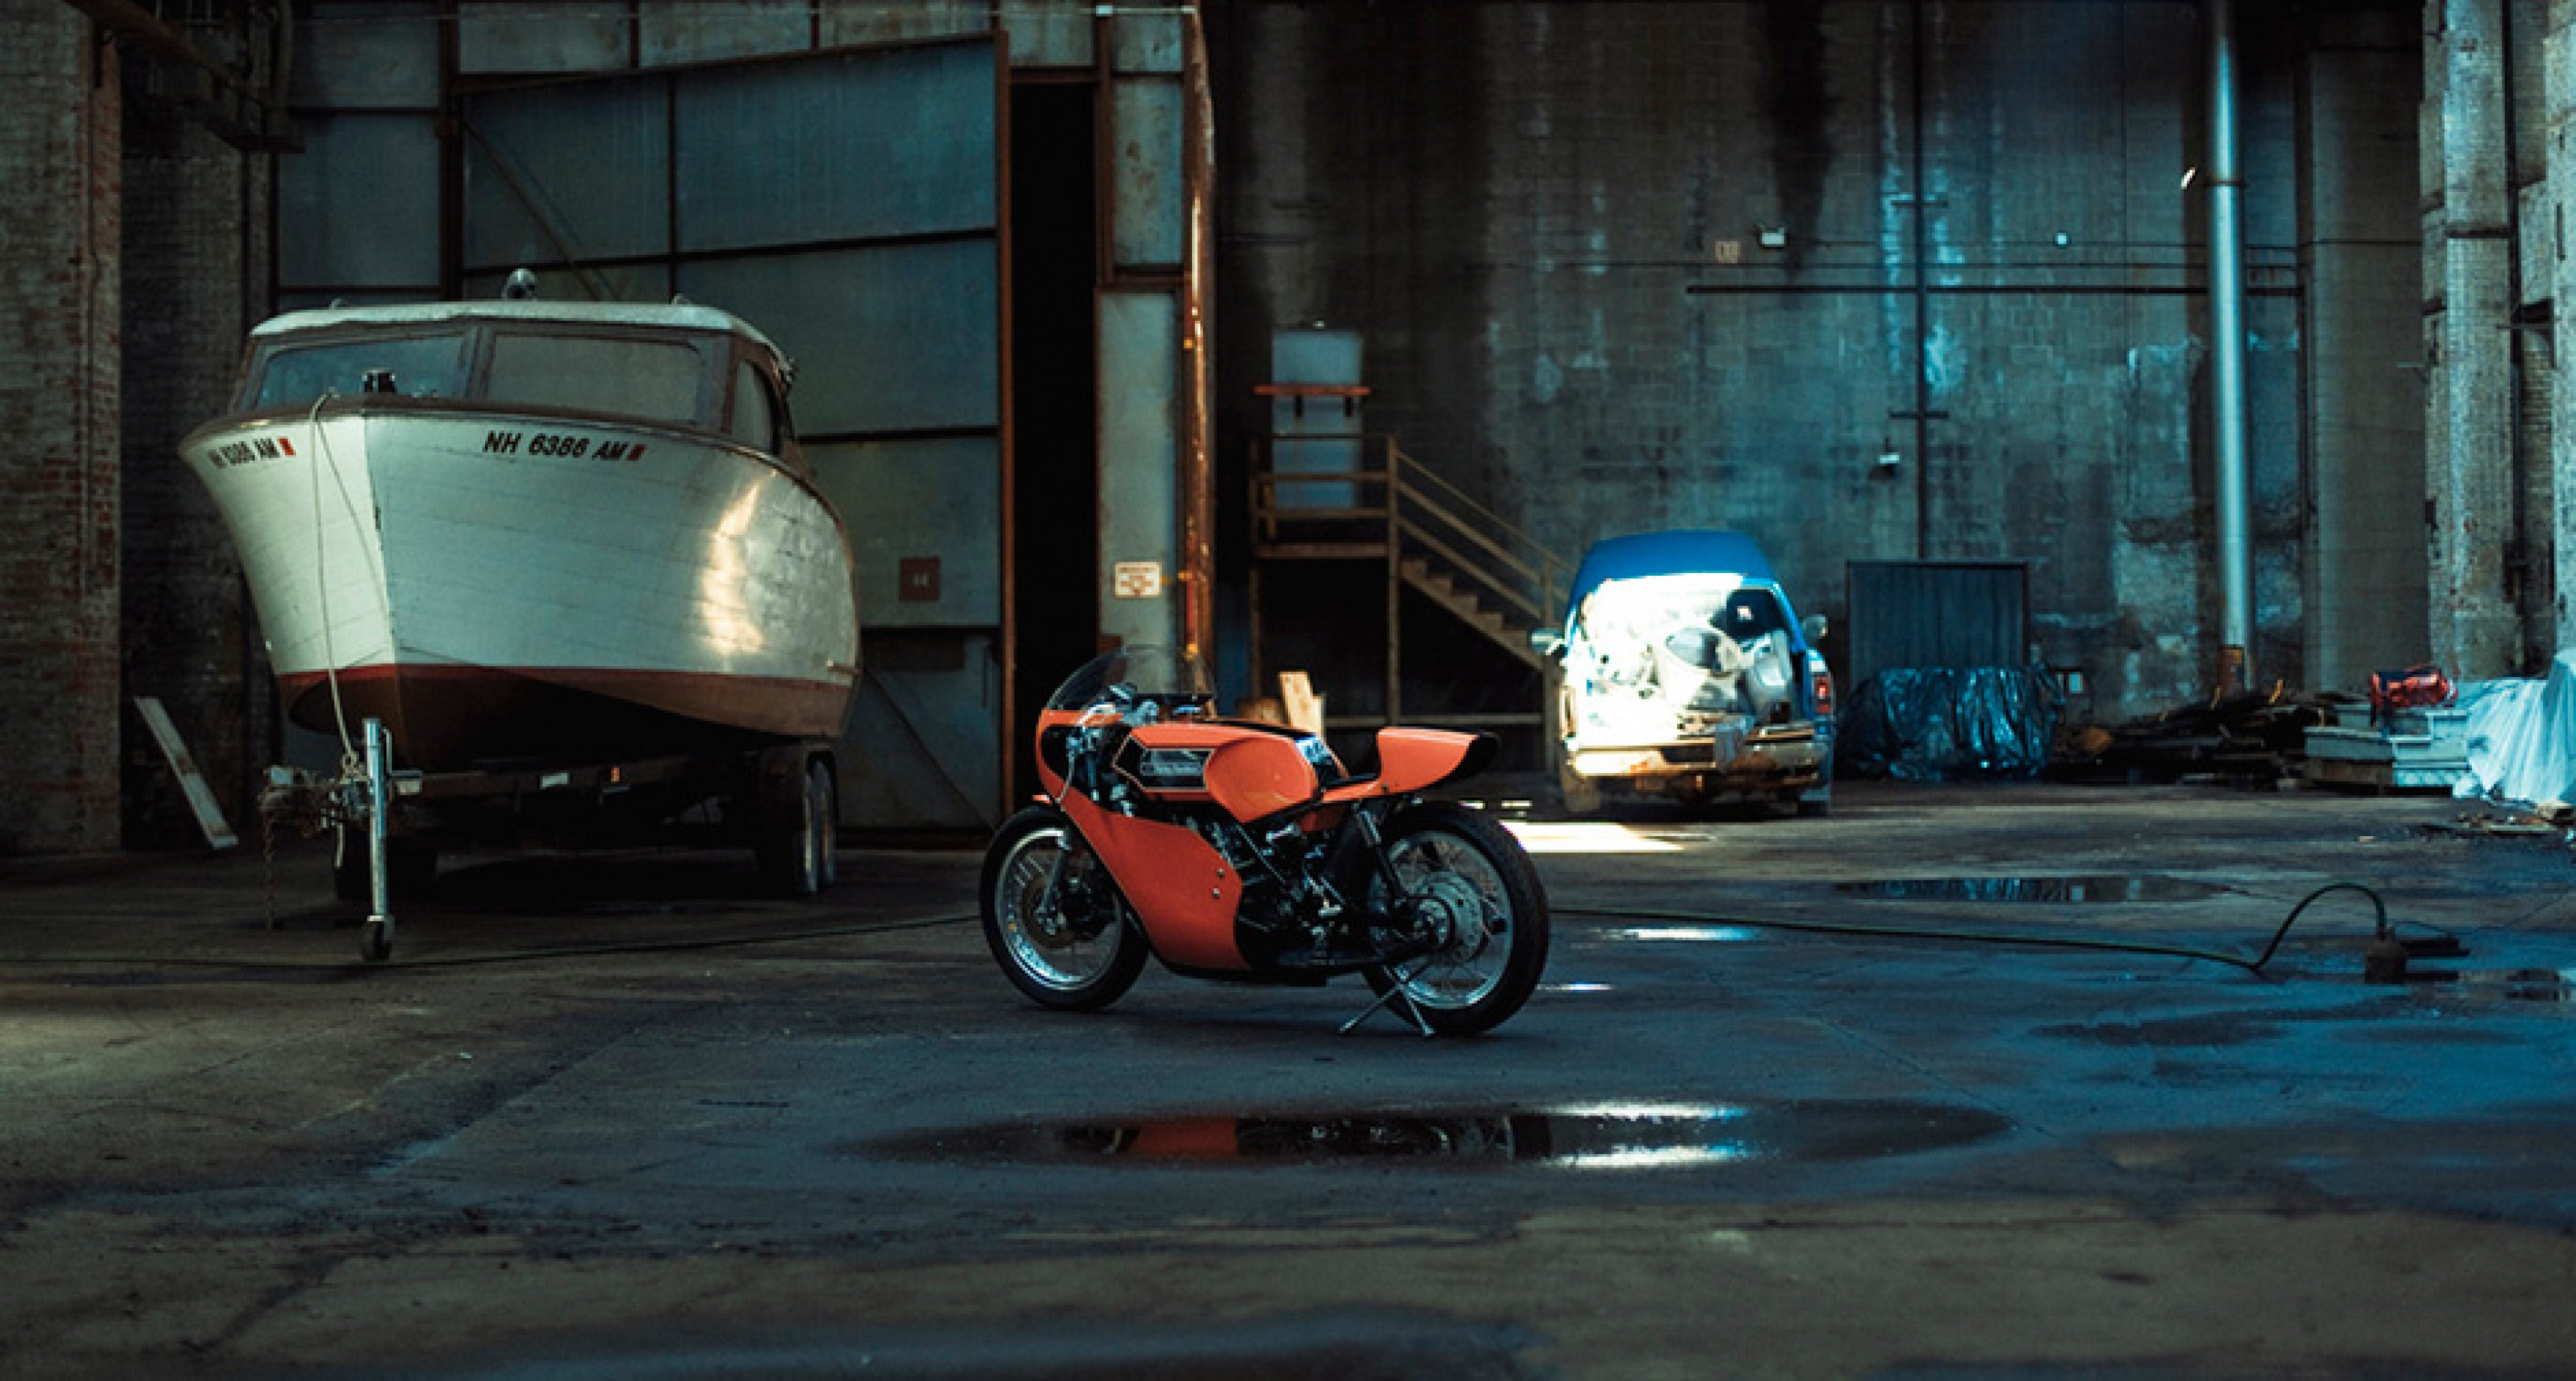 Harley Davidson: Long-lost Family: Harley-Davidson Aermacchi RR350